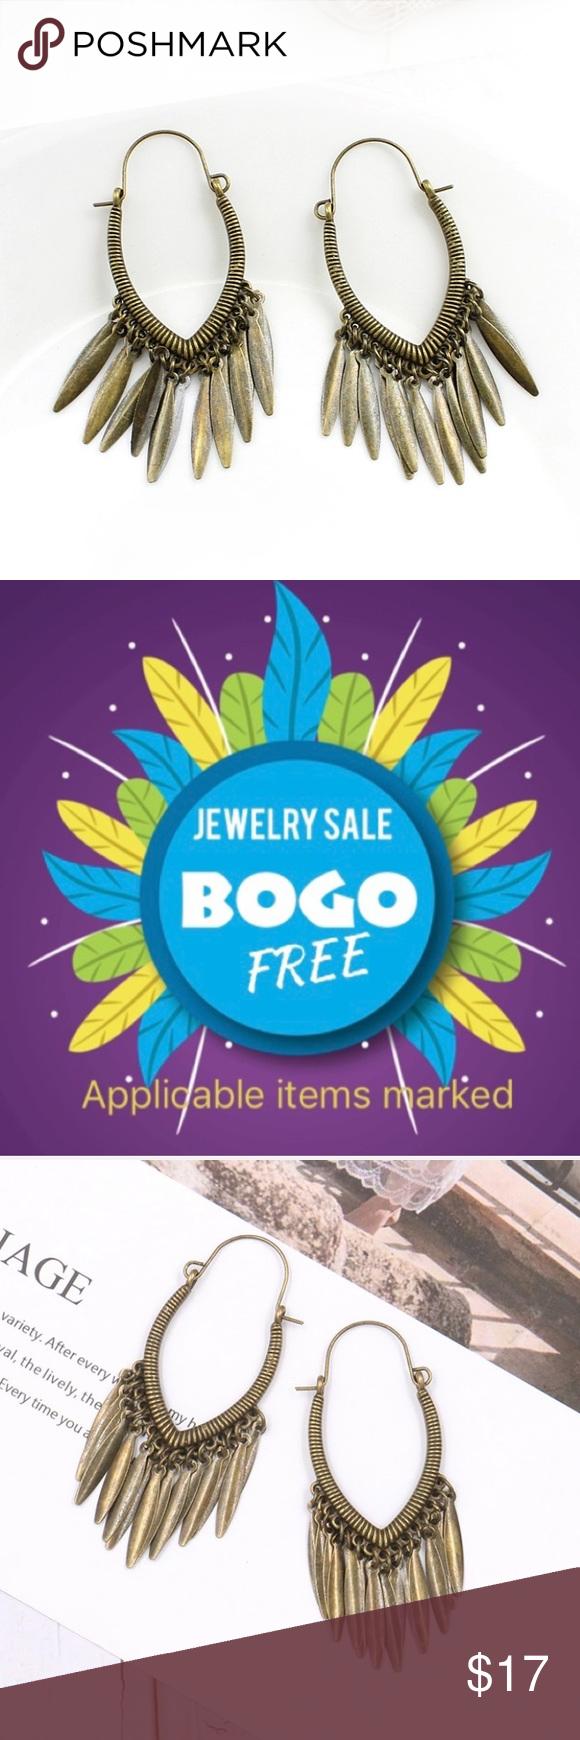 BOGO Special Spring Release of Tassel Earplugs